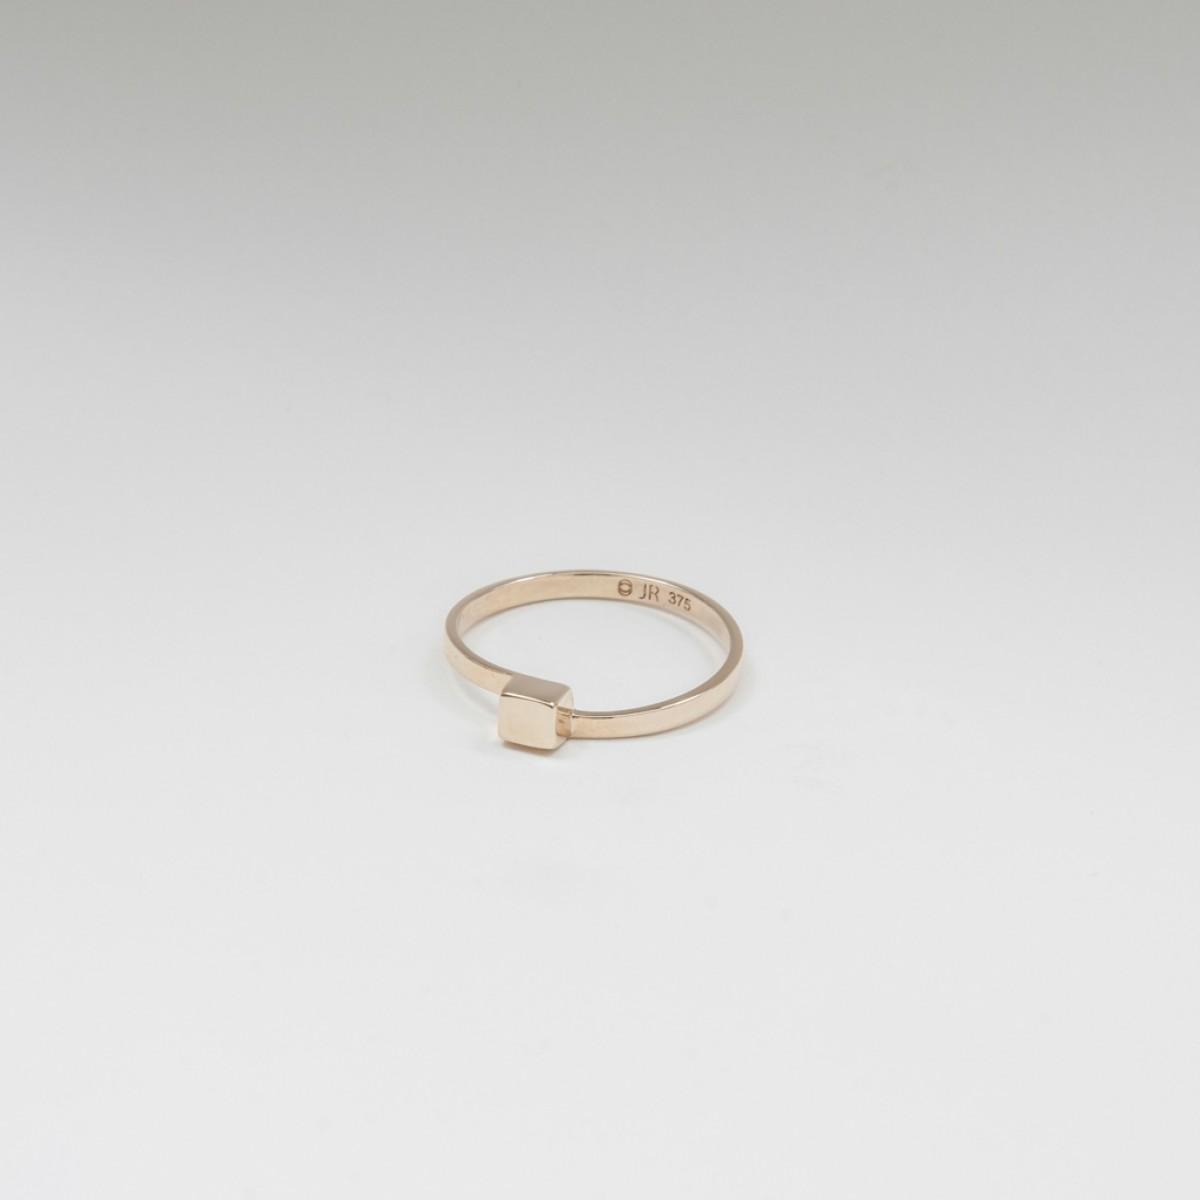 Jonathan Radetz Jewellery, Ring CUBE, Gold 375